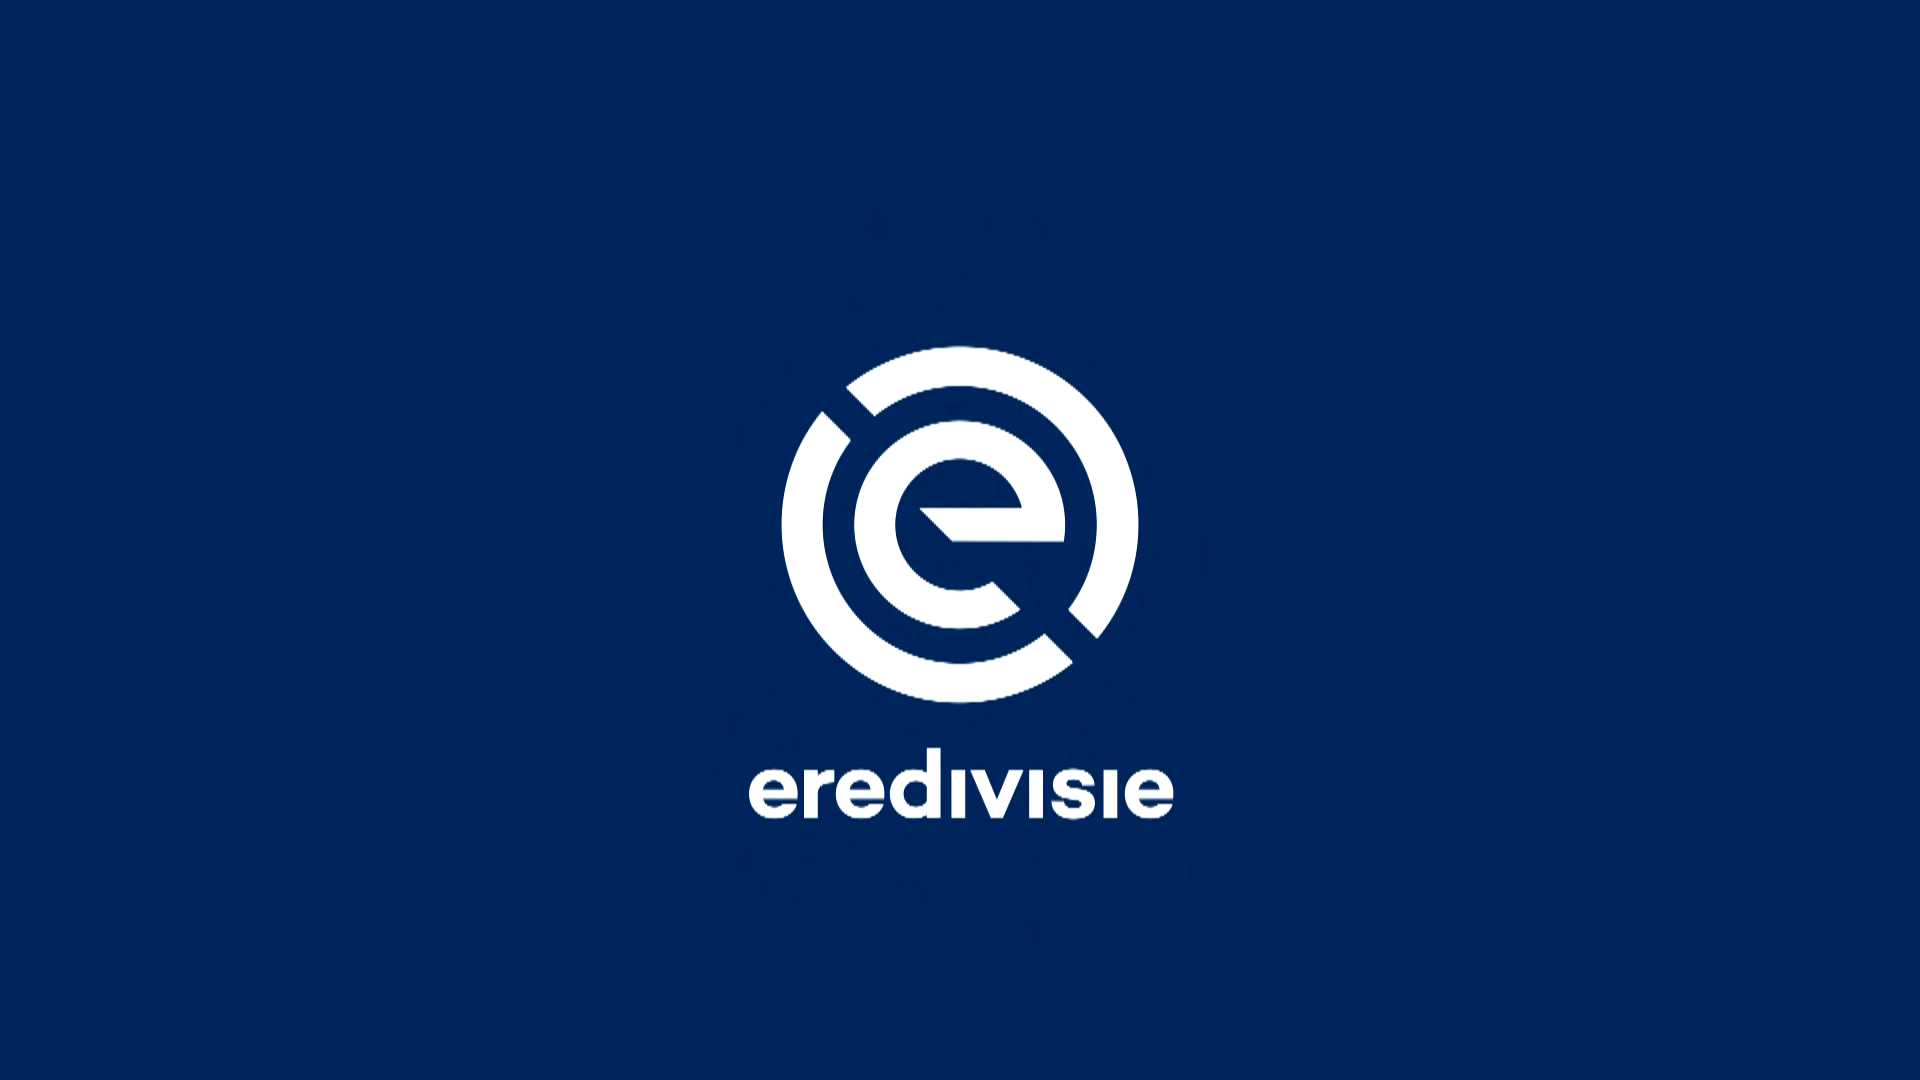 Чемпионат Нидерландов 2020/21. Обзор матчей 31 тура